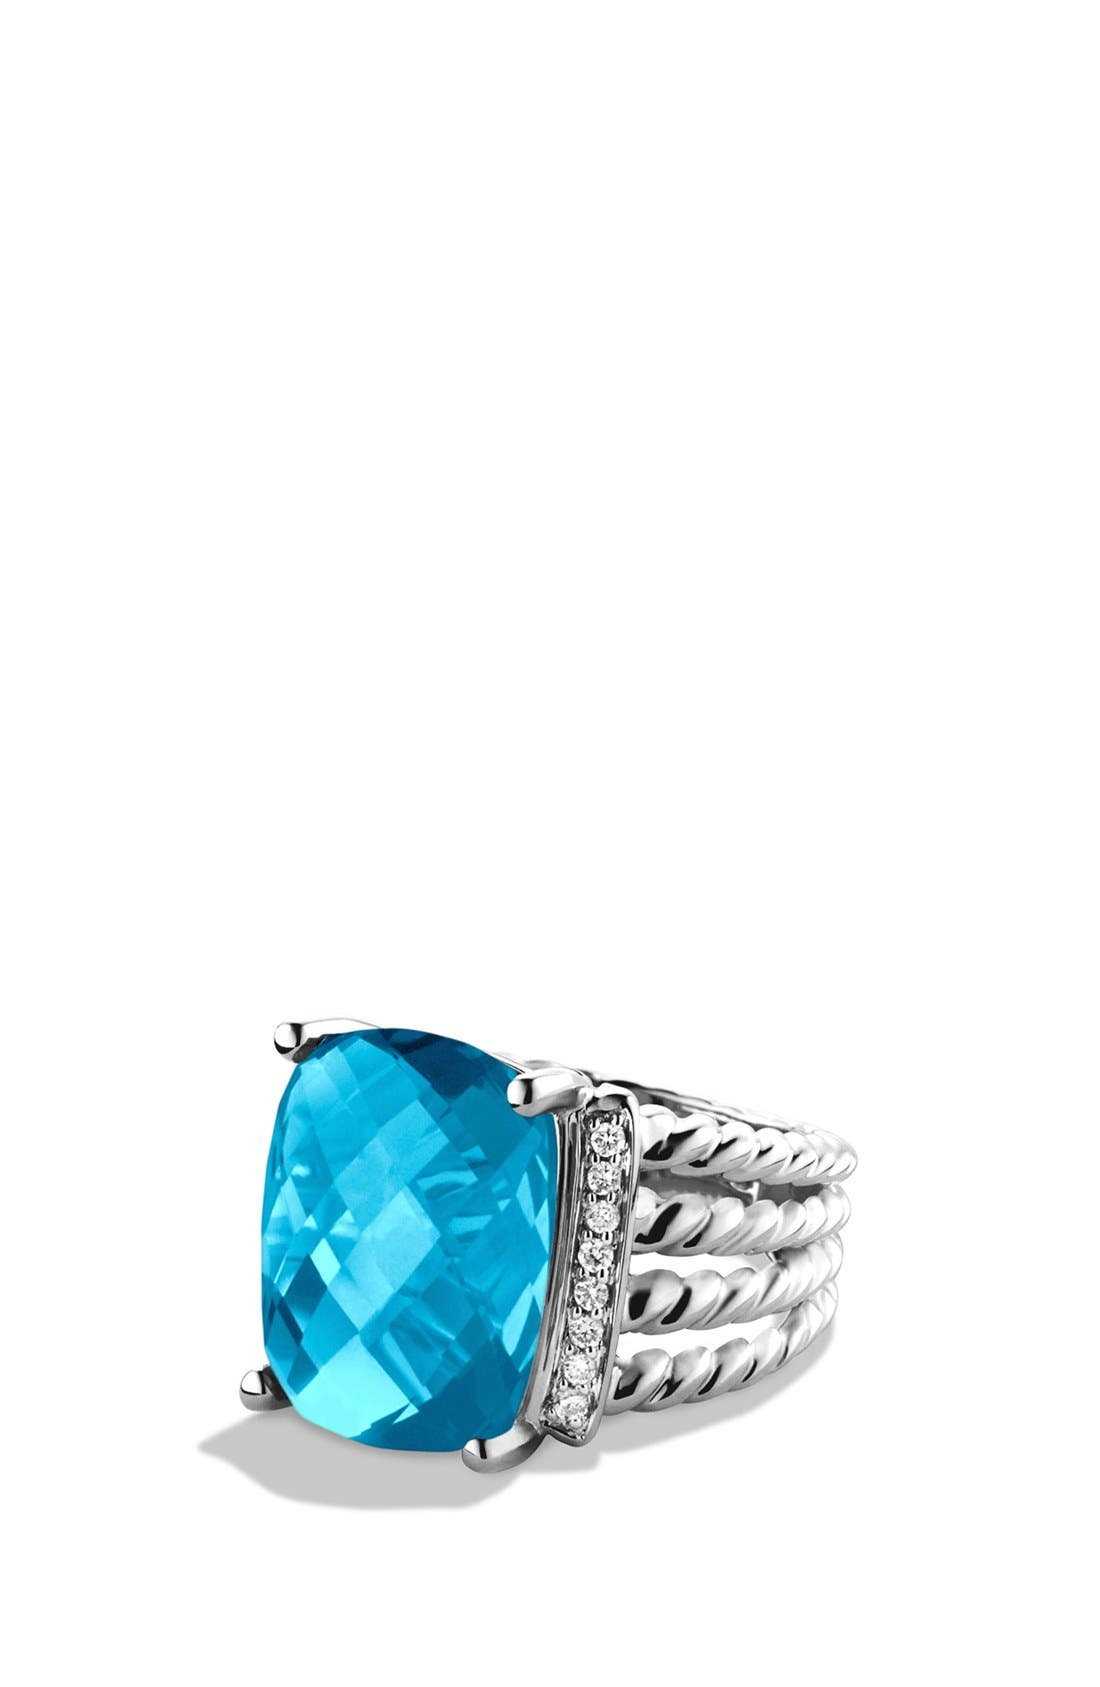 'Wheaton' Ring with Semiprecious Stone & Diamonds,                             Main thumbnail 1, color,                             Blue Topaz